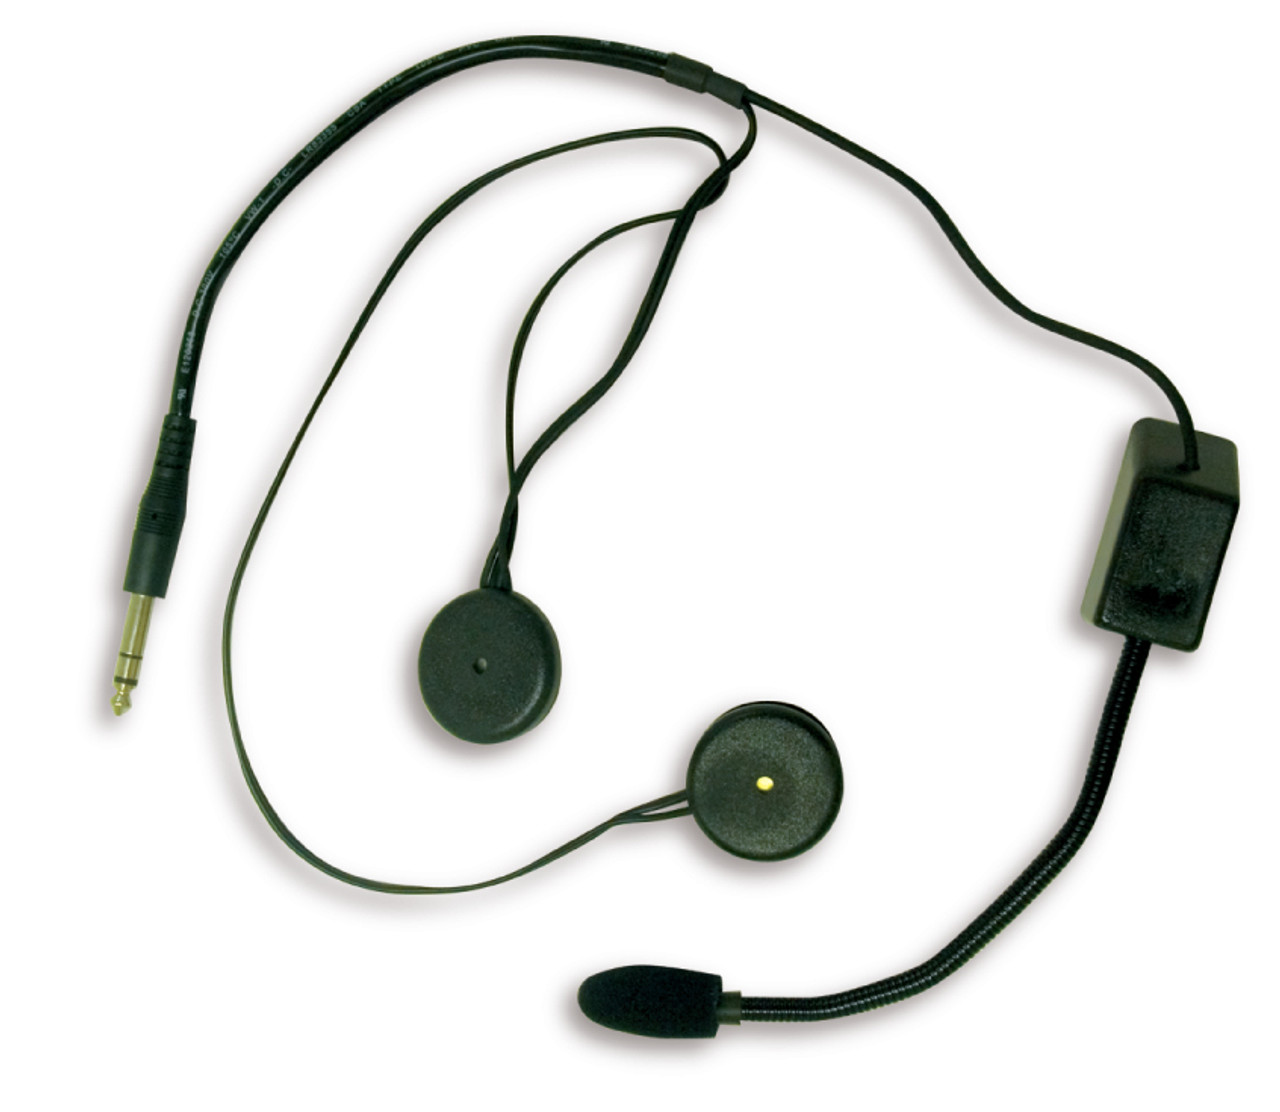 Professional Intercom OF Headset